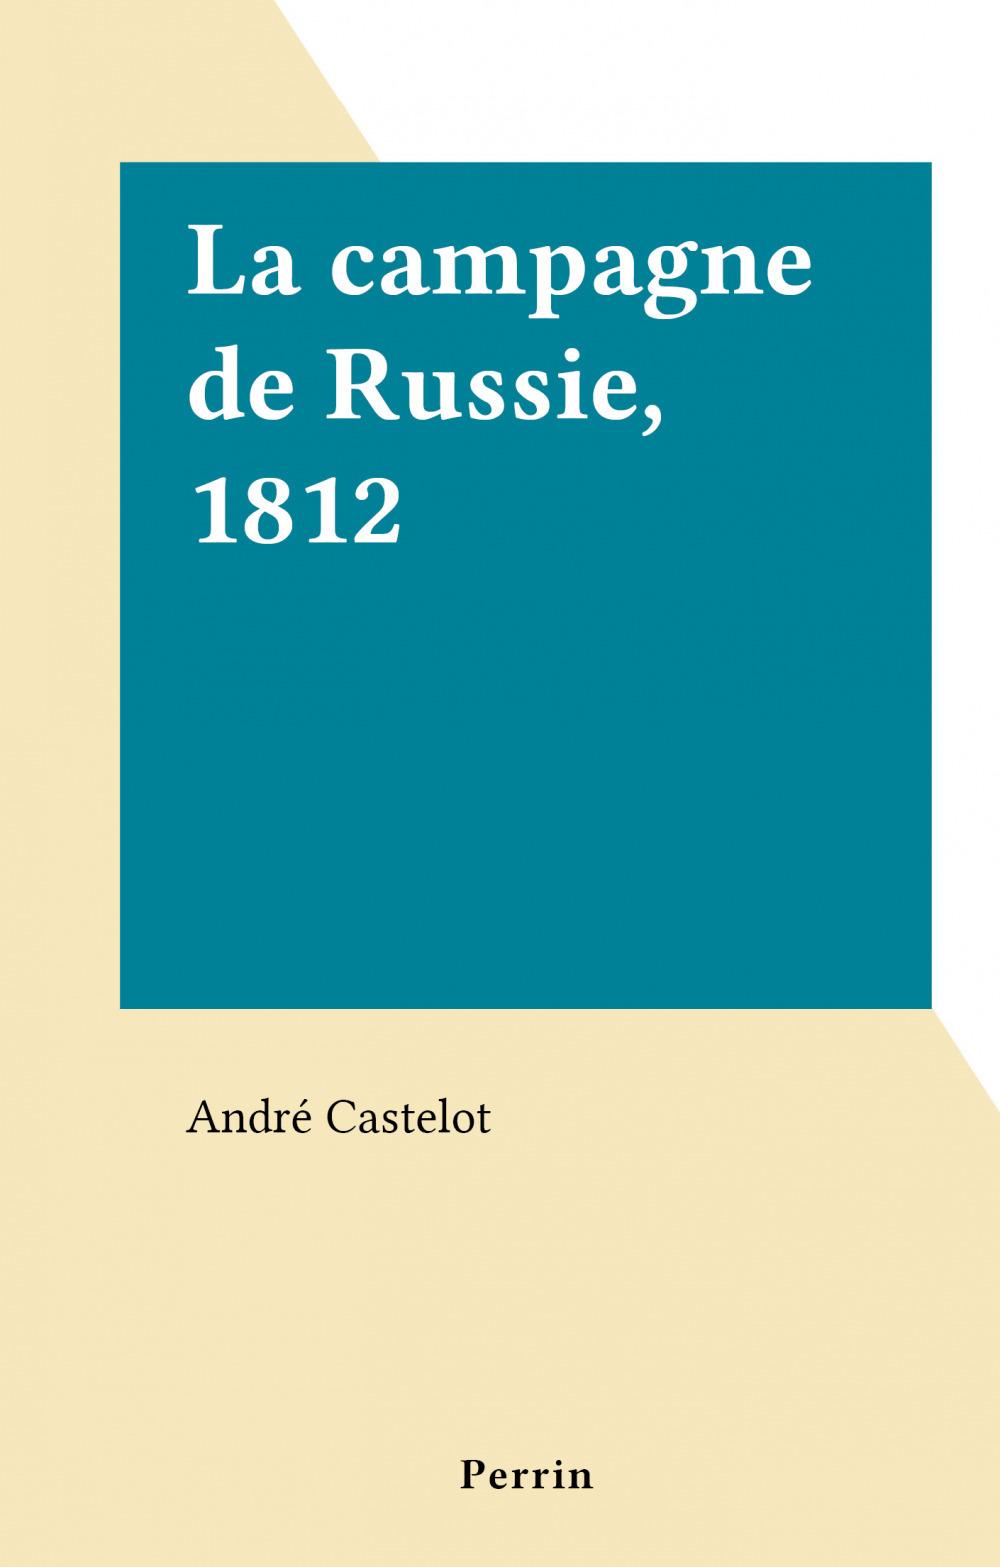 La campagne de Russie, 1812